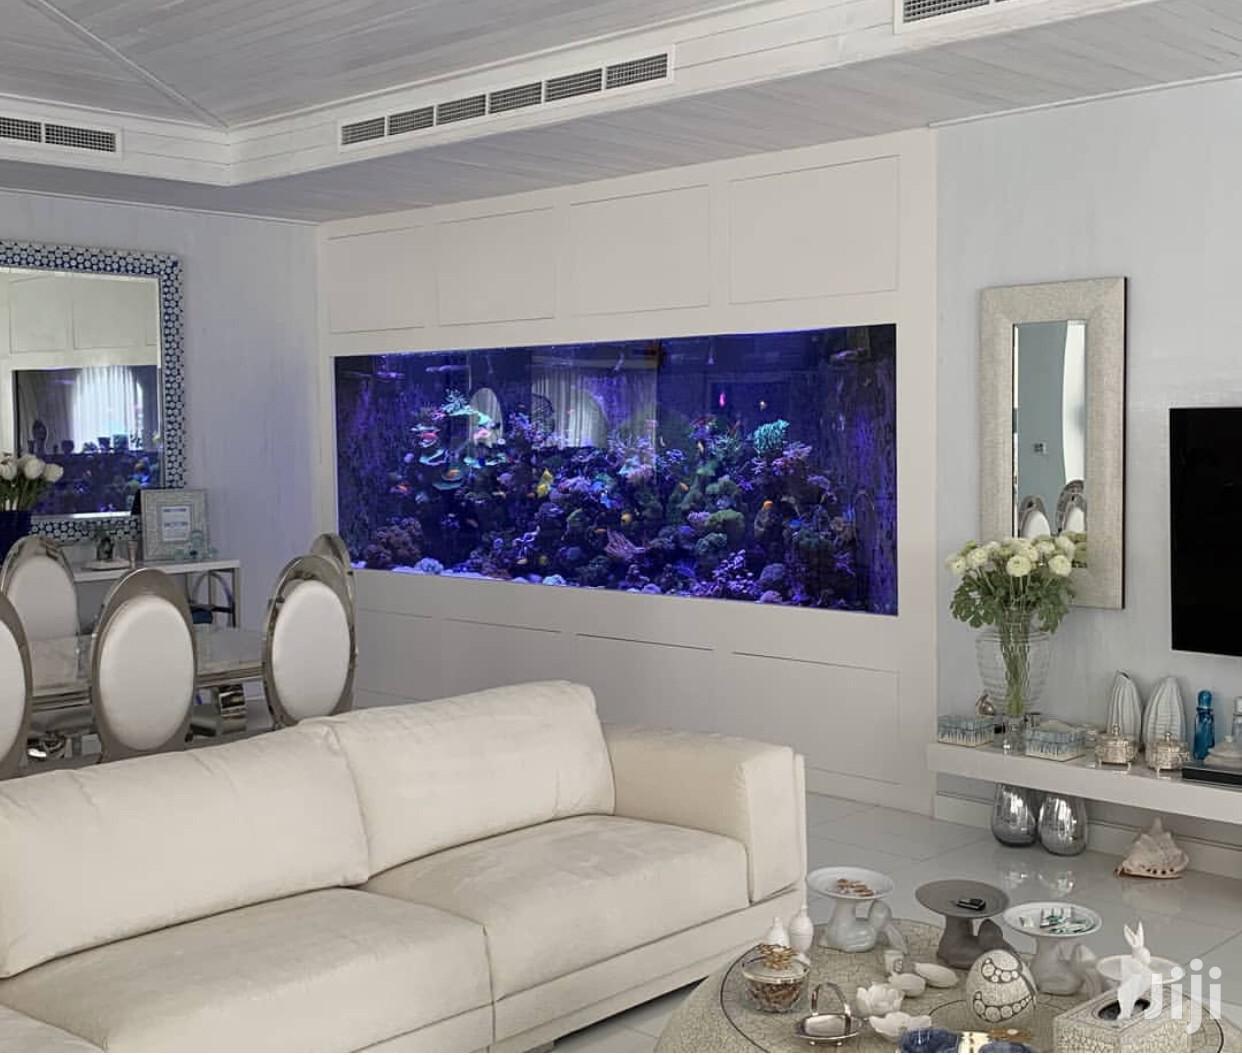 Inside Wall Aquarium | Fish for sale in Warri, Delta State, Nigeria